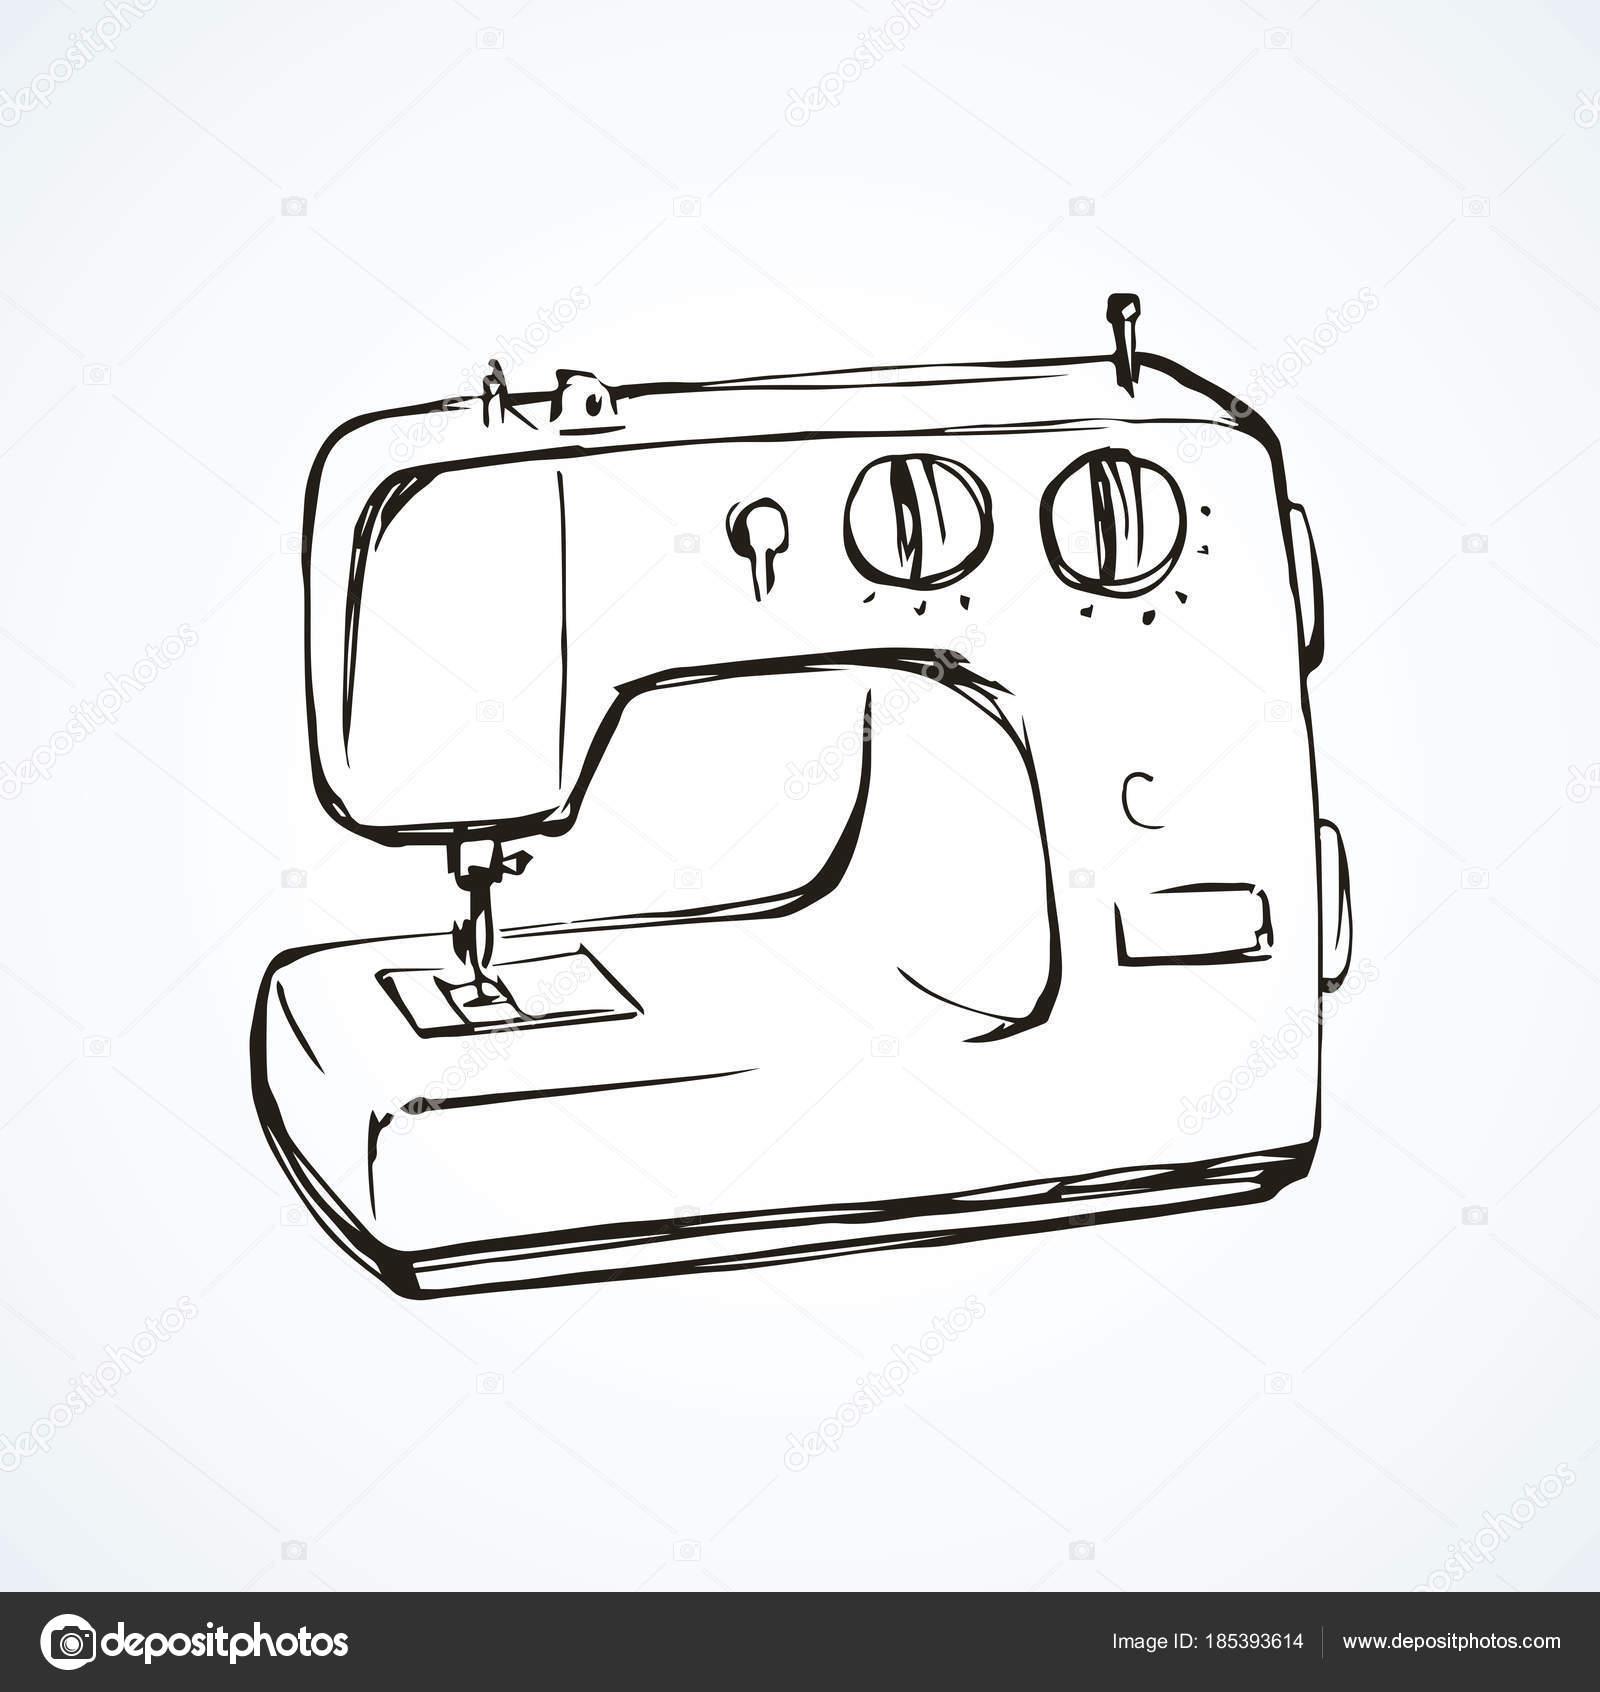 personnes notables dessin de machine coudre jv16 humatraffin. Black Bedroom Furniture Sets. Home Design Ideas